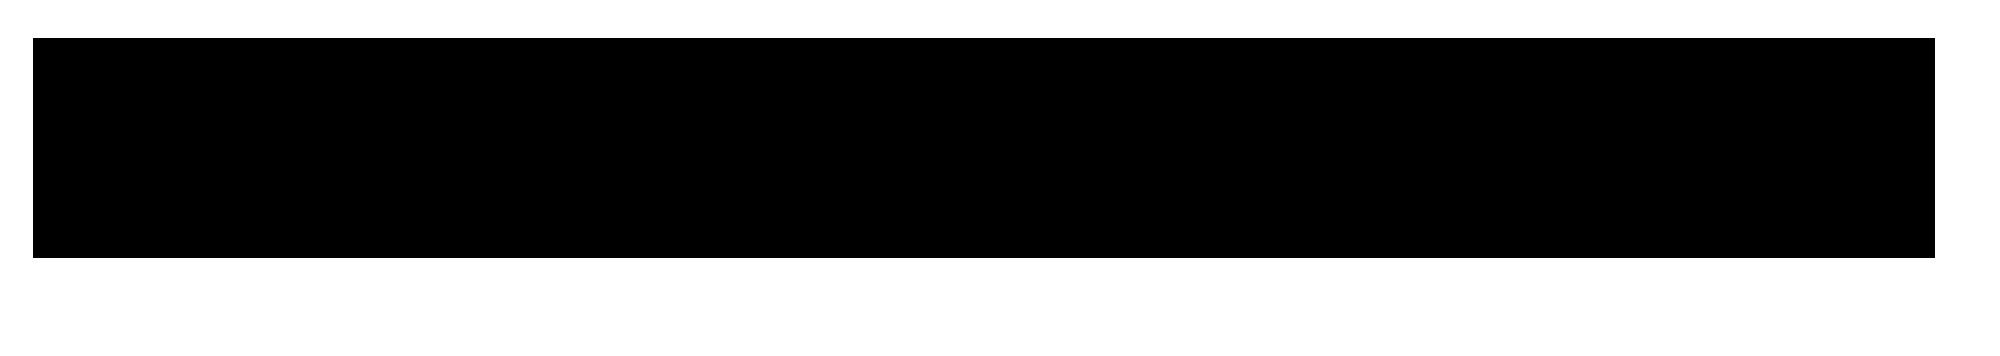 Harald Hermanrud logo.png